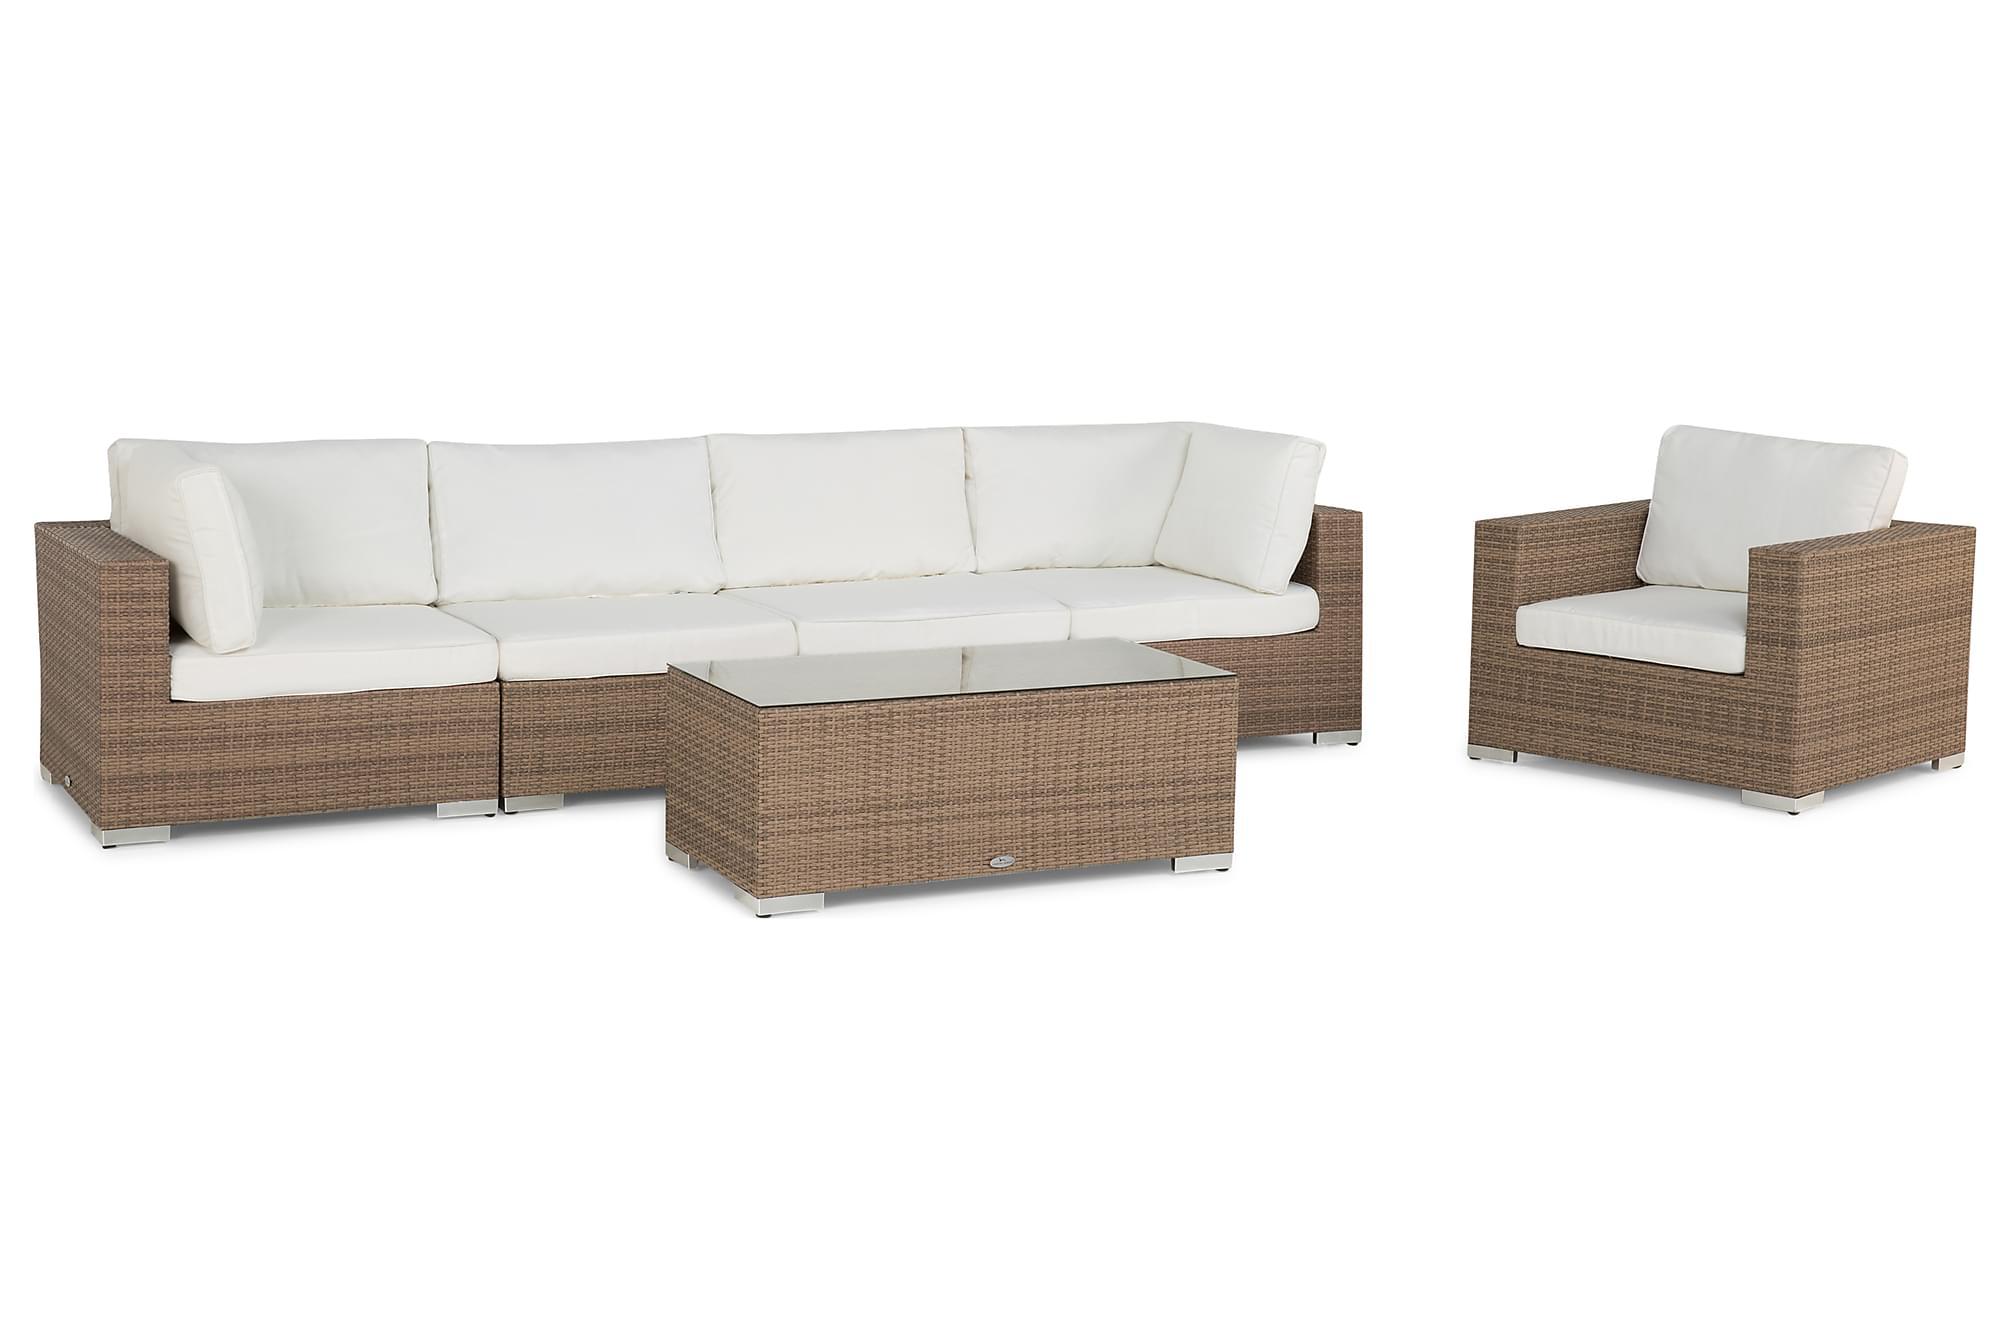 BAHAMAS Loungesoffa 4-sits + Bord + Fåtölj Sand